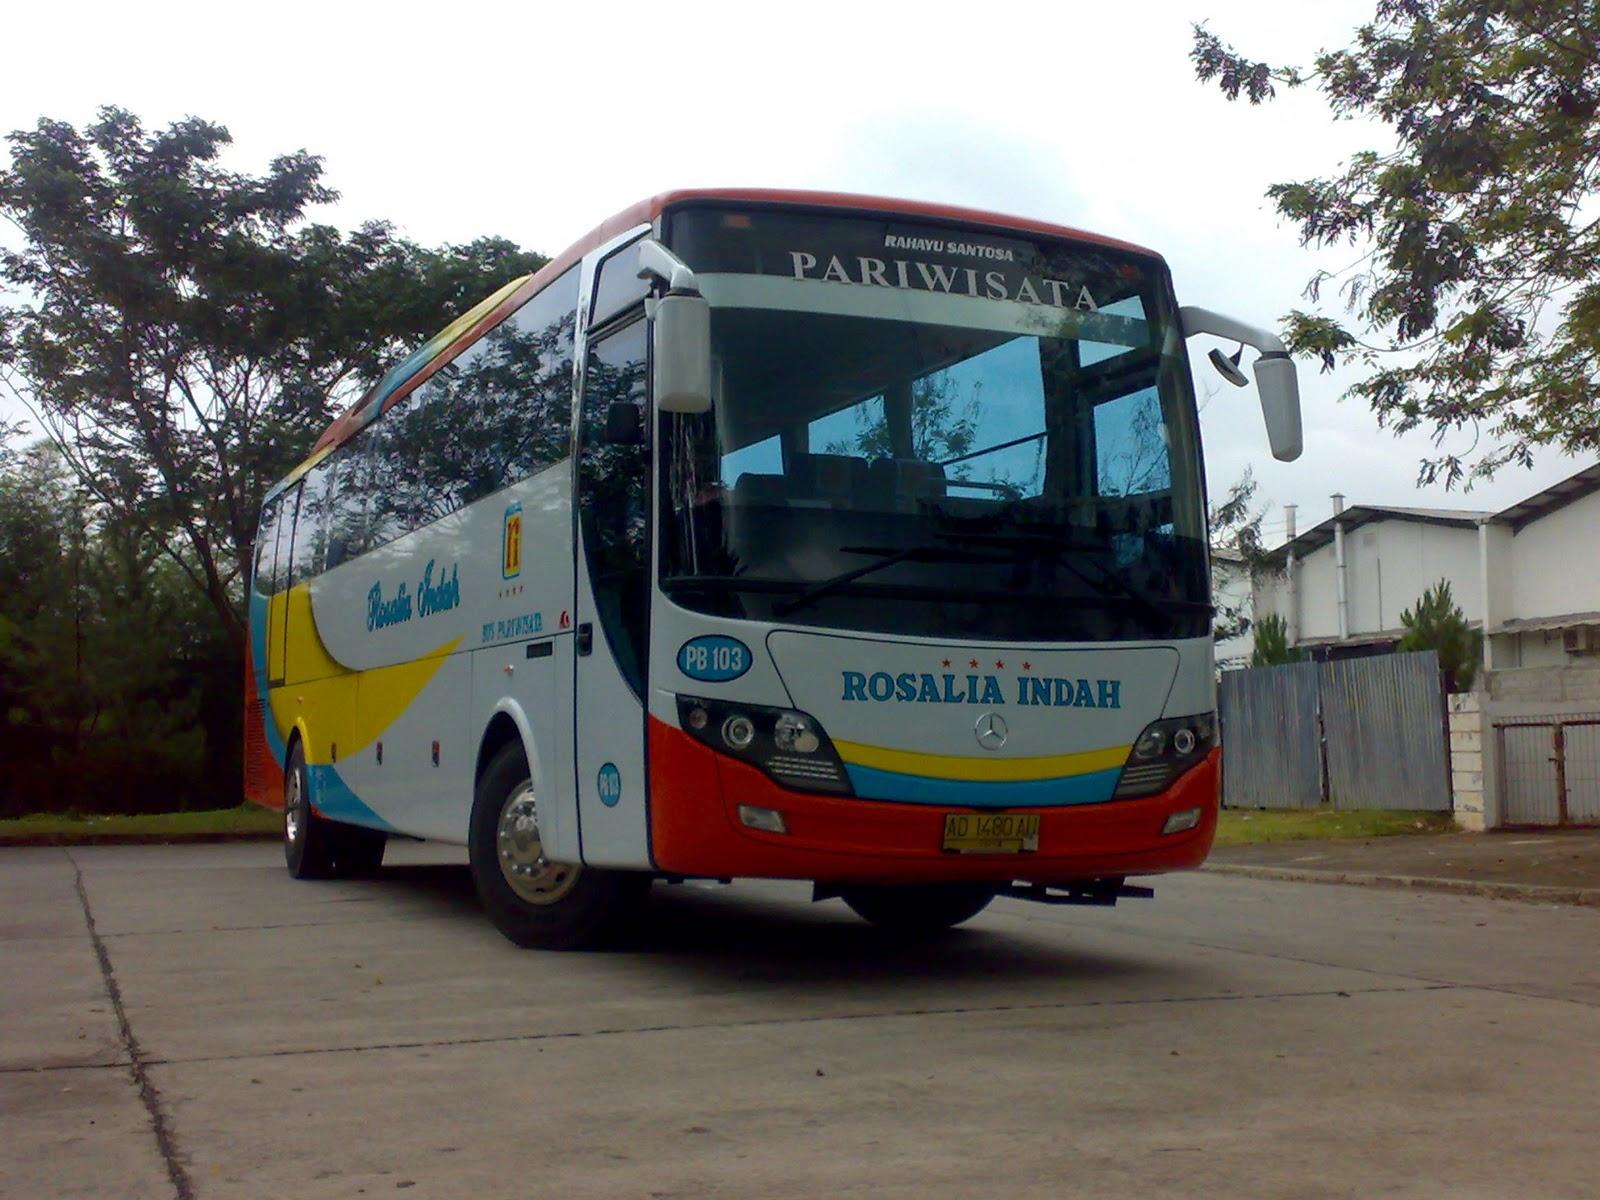 Bus pariwisata rosalia indah